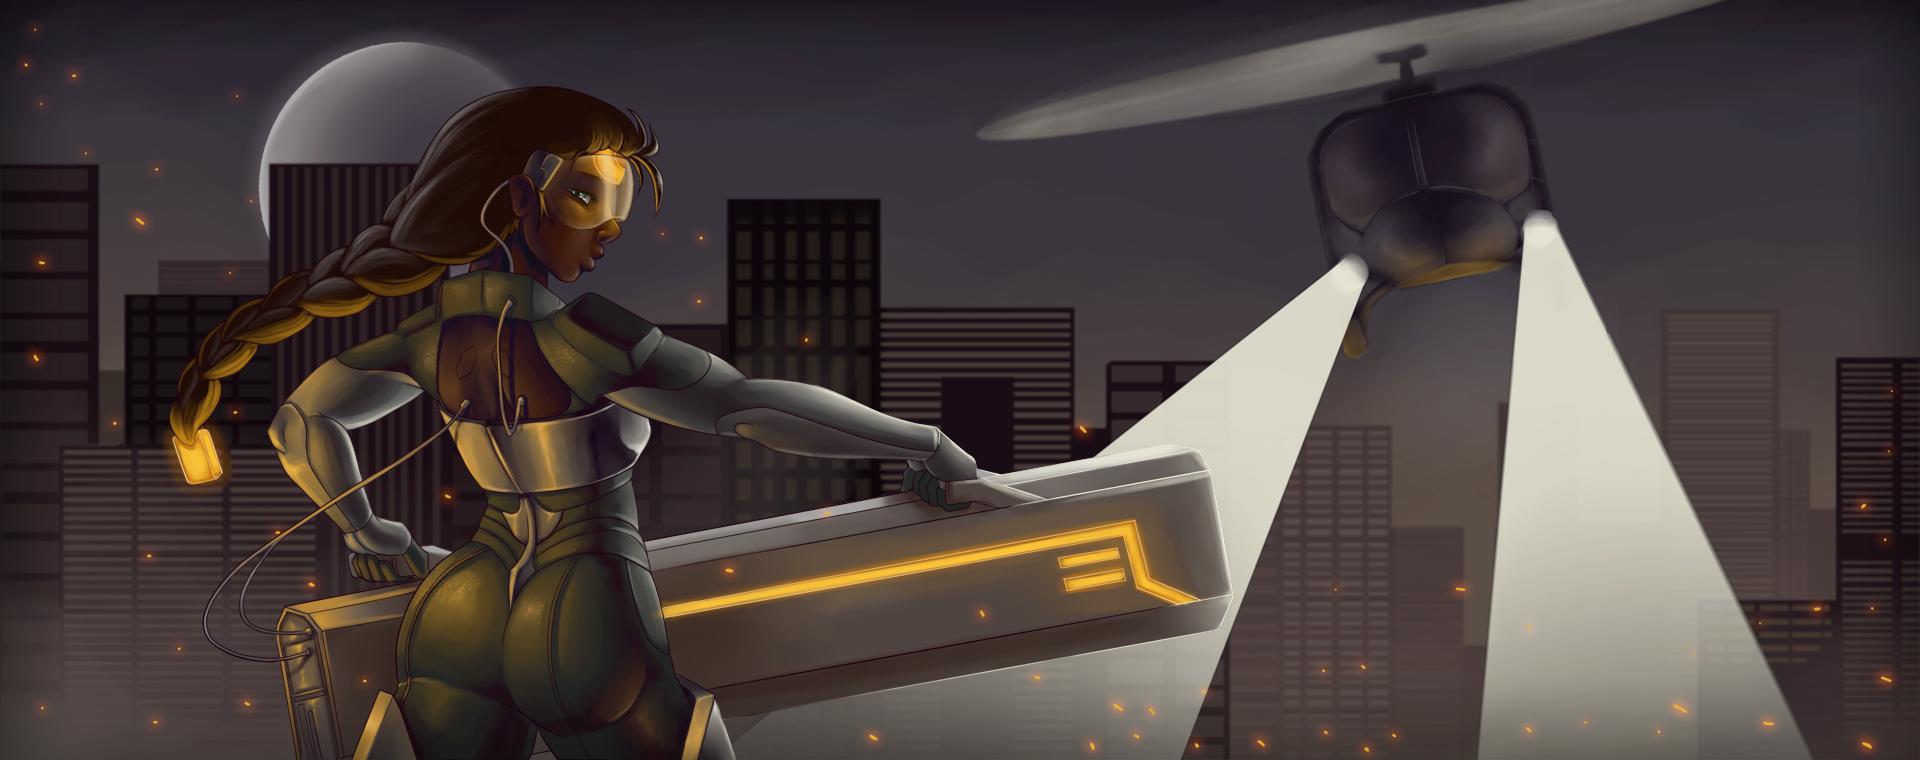 Spy Battle 2165 Landing Page Image, SHG Studios